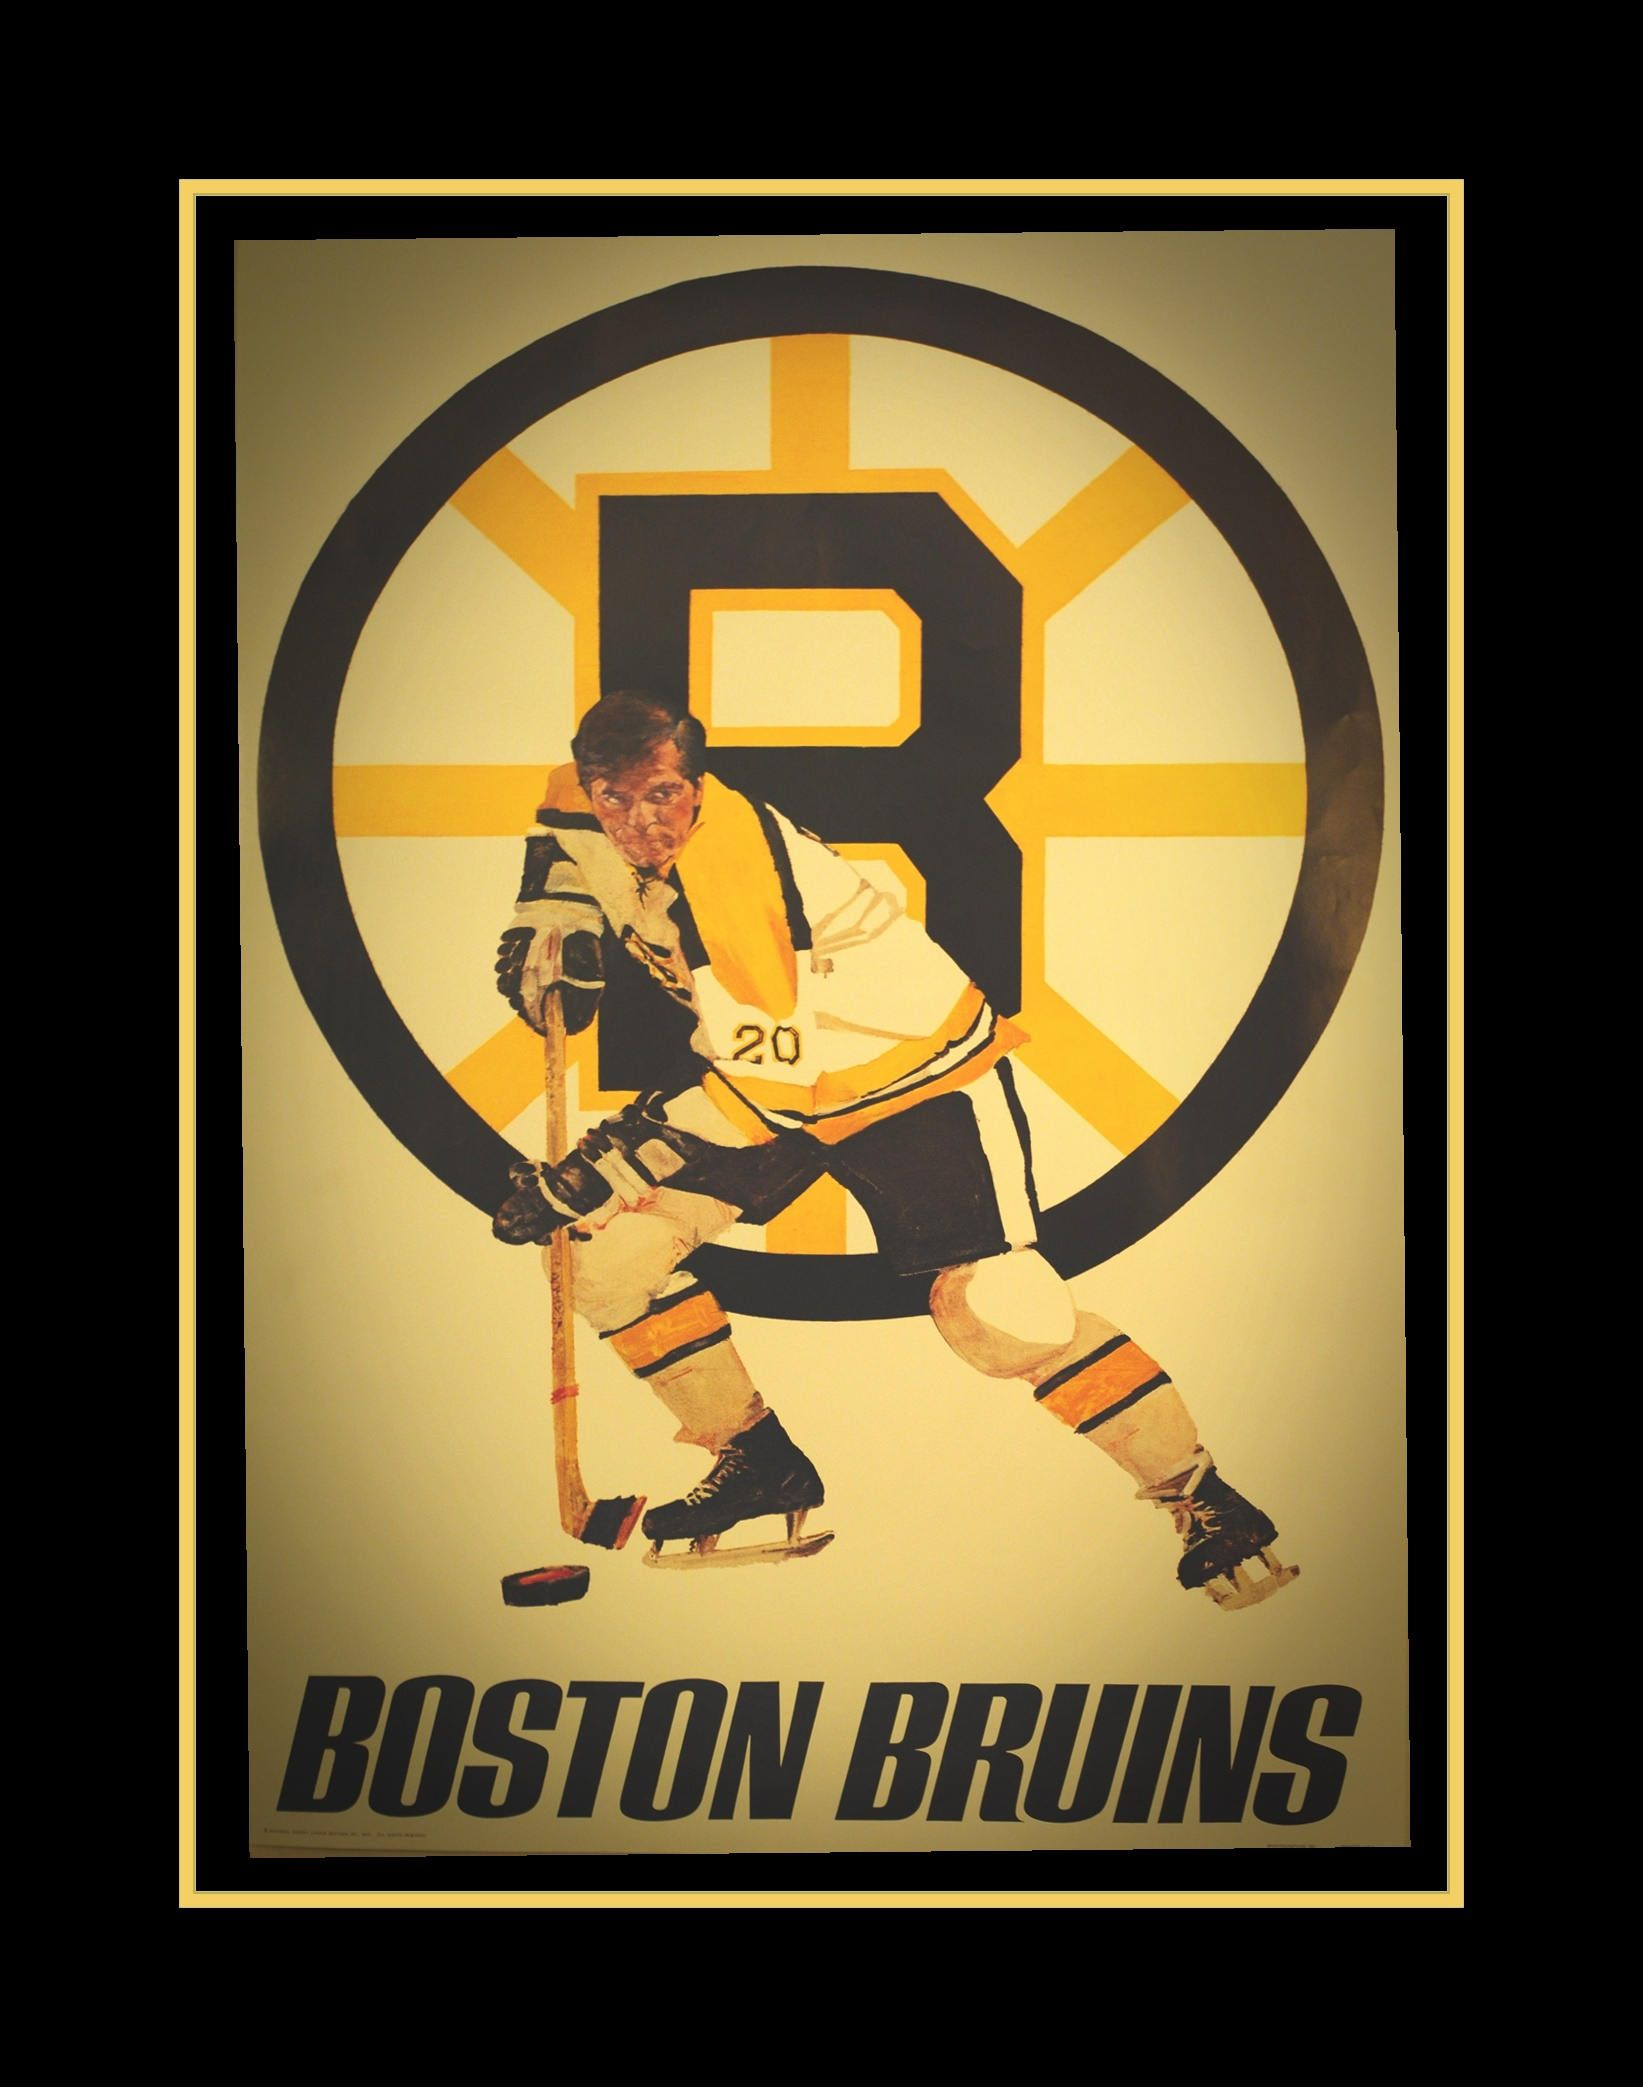 Vintage 1970s Boston Bruins Logo Poster, Gift, Hockey Illustration ...